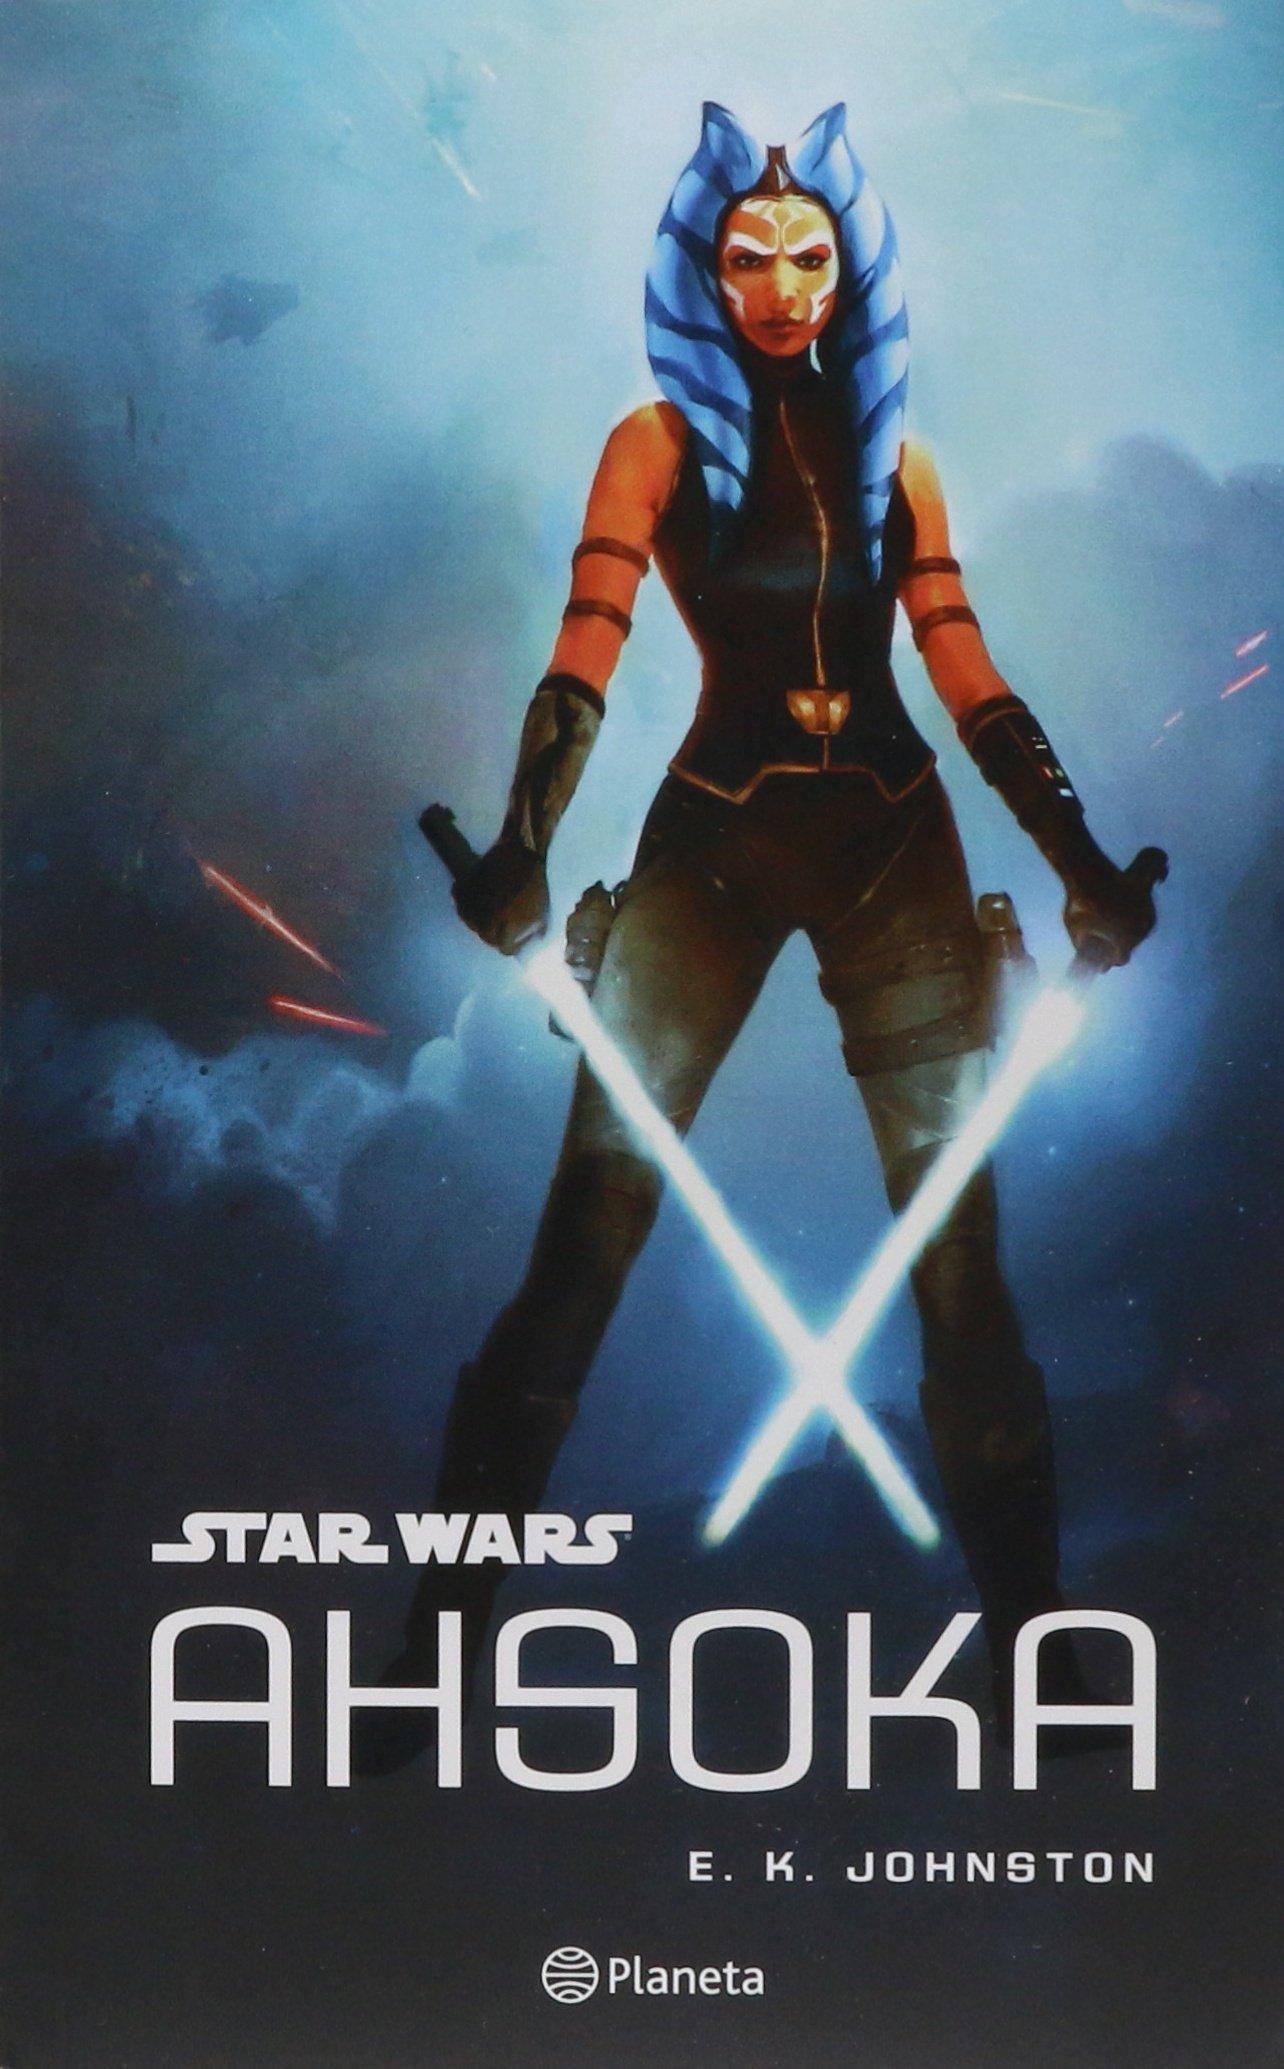 Star wars: Ahsoka: Hustvedt, Siri: 9786070744358: Amazon.com: Books